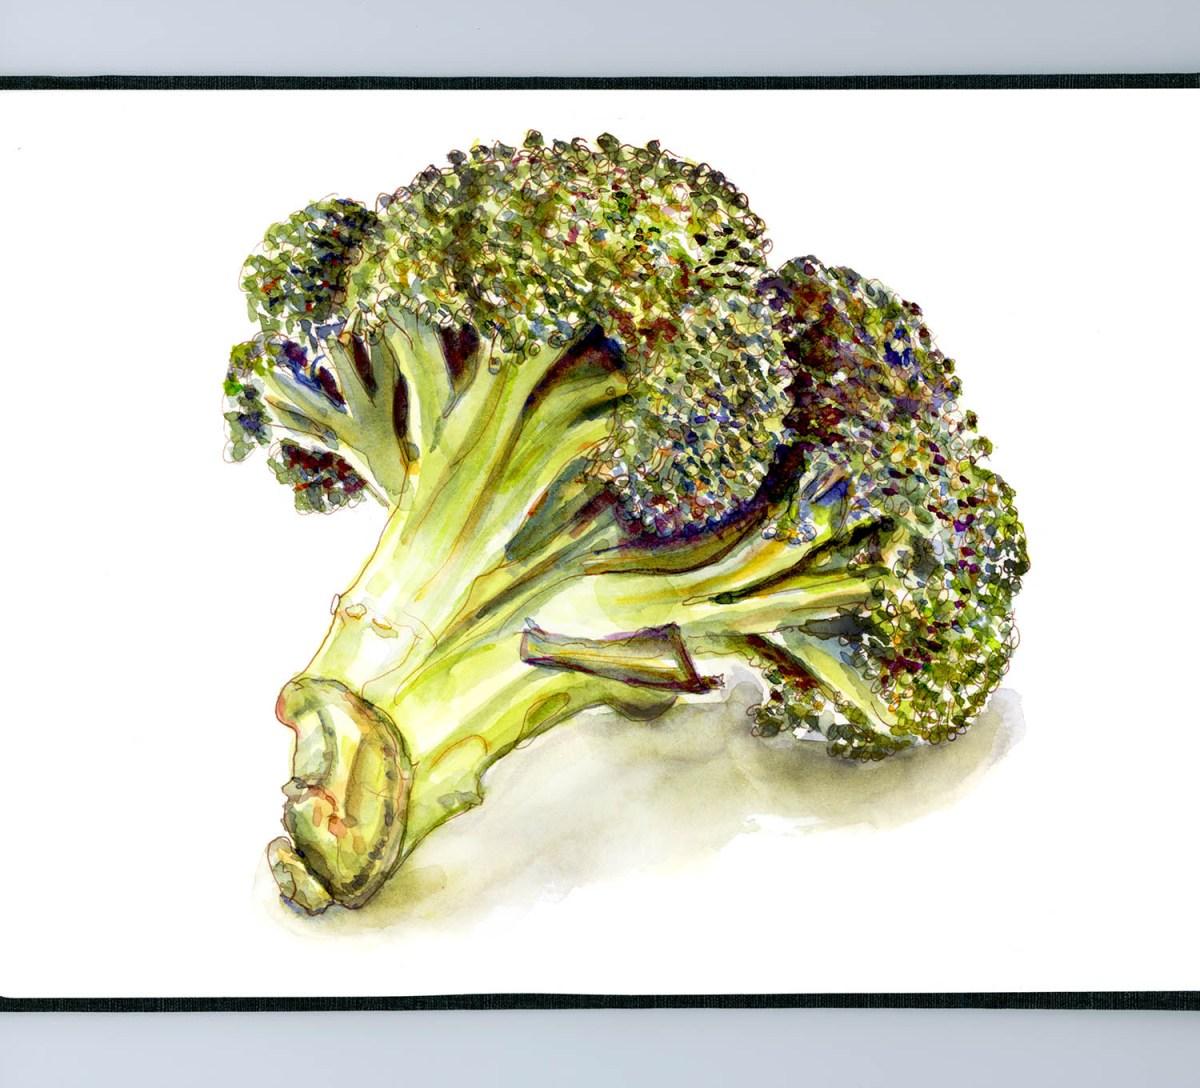 Day 23 - Broccoli - Eating Little Trees - #doodlewashApril2018 Doodlewash